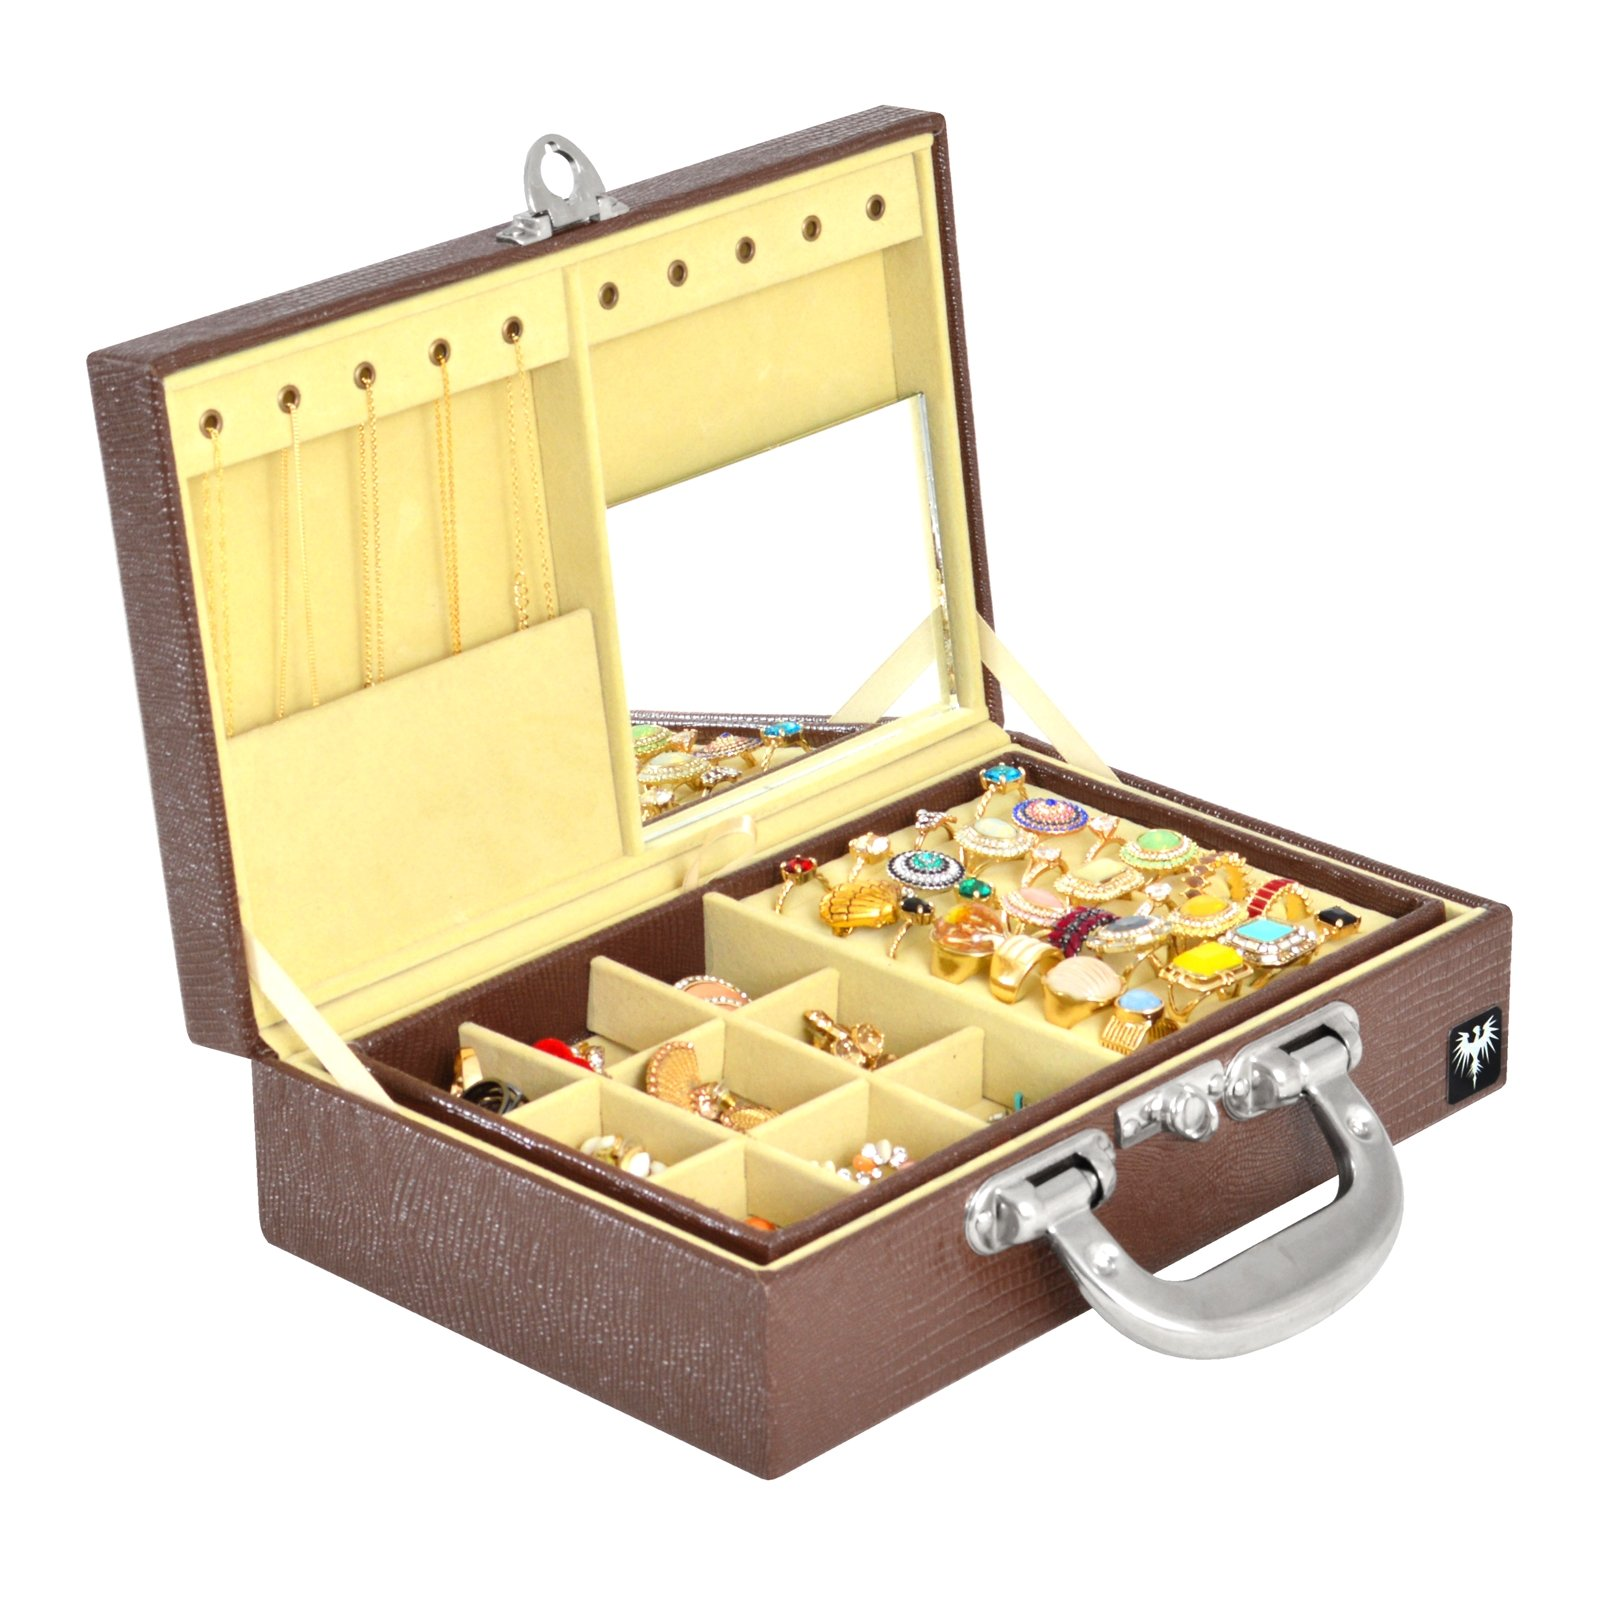 maleta-porta-joias-couro-ecologico-croco-marrom-bege-imagem-2.jpg